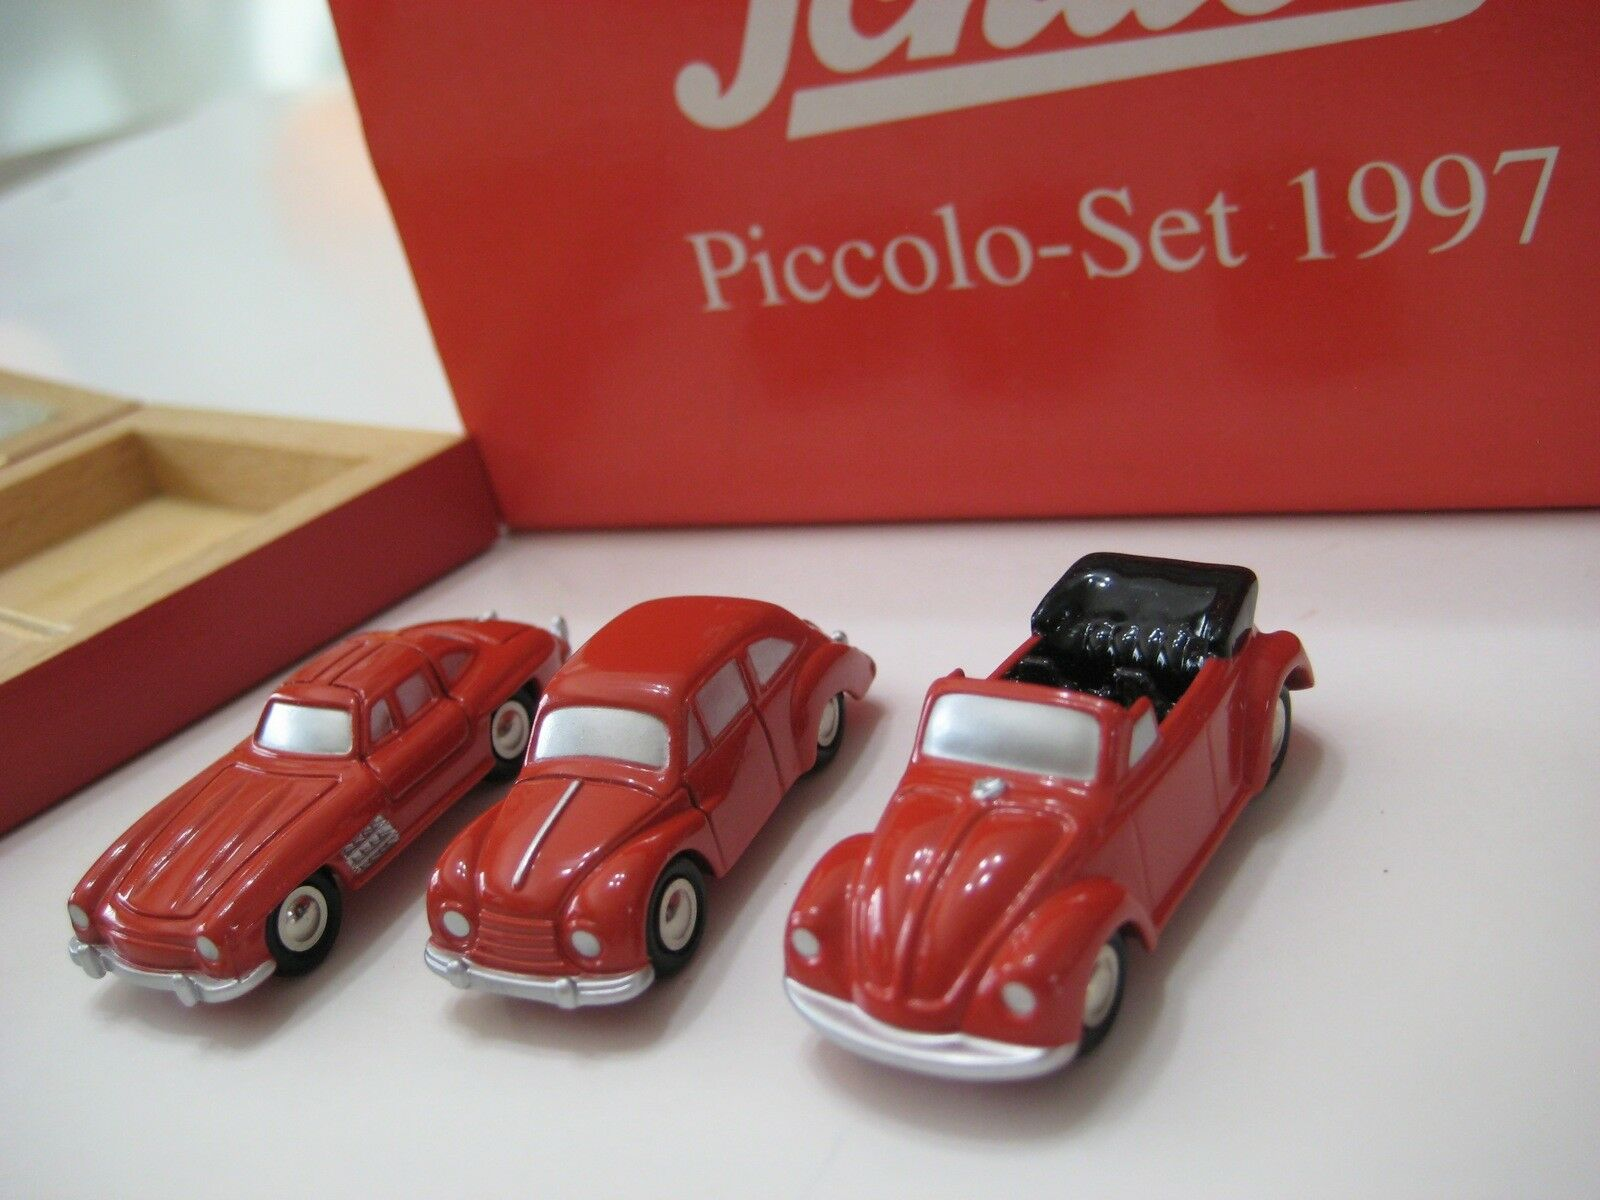 Schuco Piccolo-Set 1997 (Germany) Red Volkswagen, DKW & Mercedes-Benz 1 90 NIB